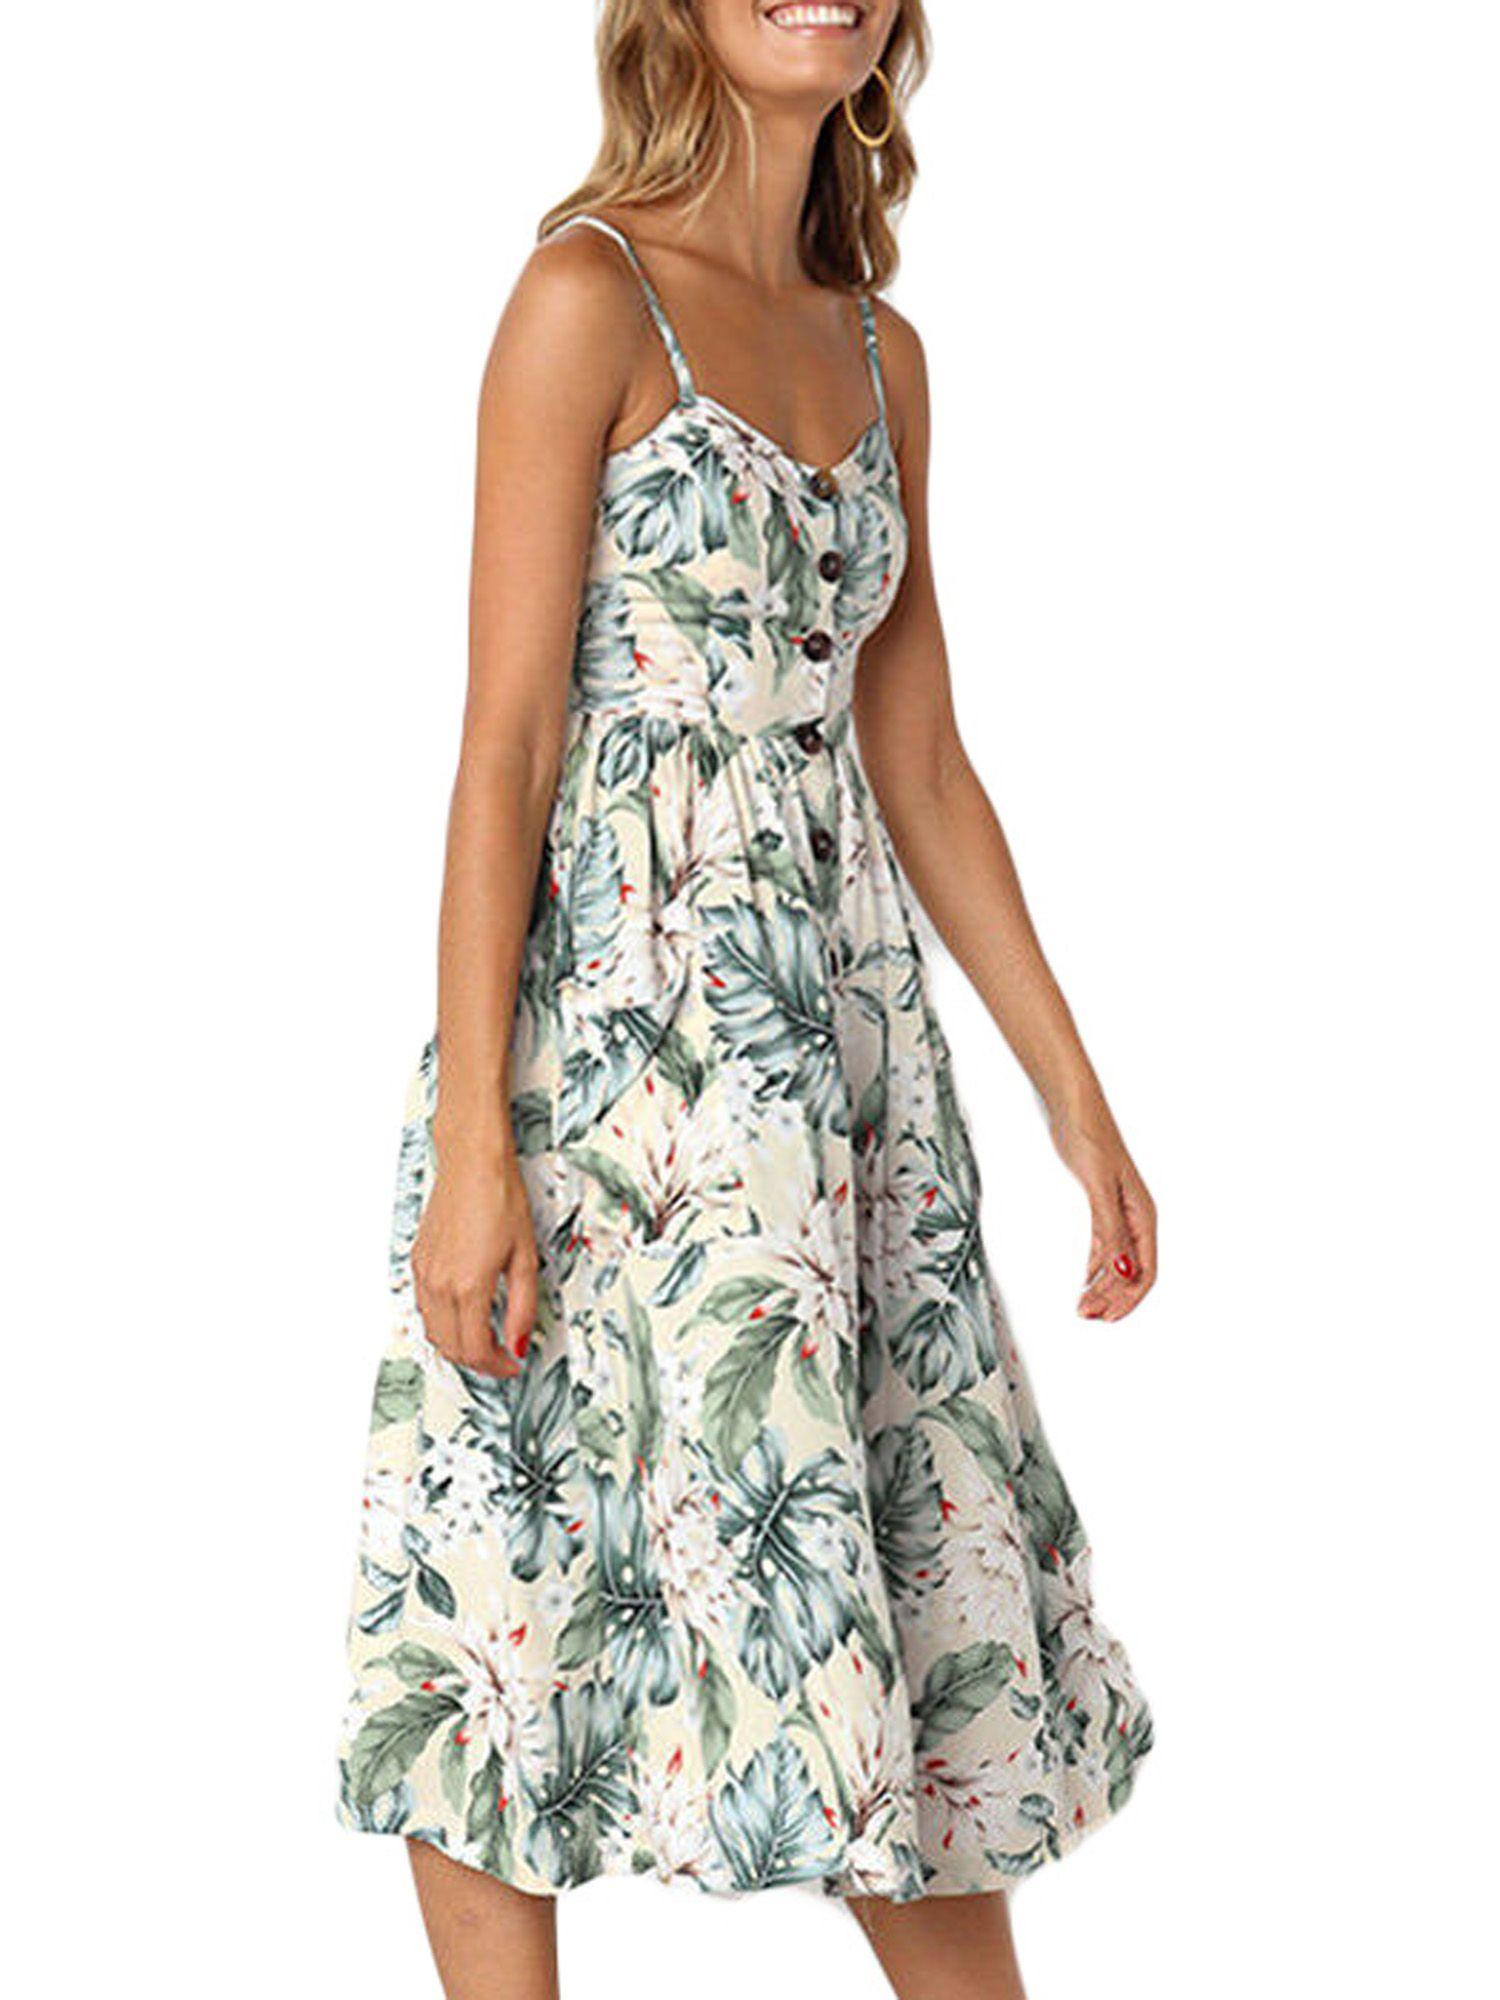 Wodstyle Women S Strappy Floral Summer Beach Party Midi Swing Dress Walmart Com Summer Maxi Dress Floral Midi Swing Dress Summer Dresses [ 2000 x 1500 Pixel ]